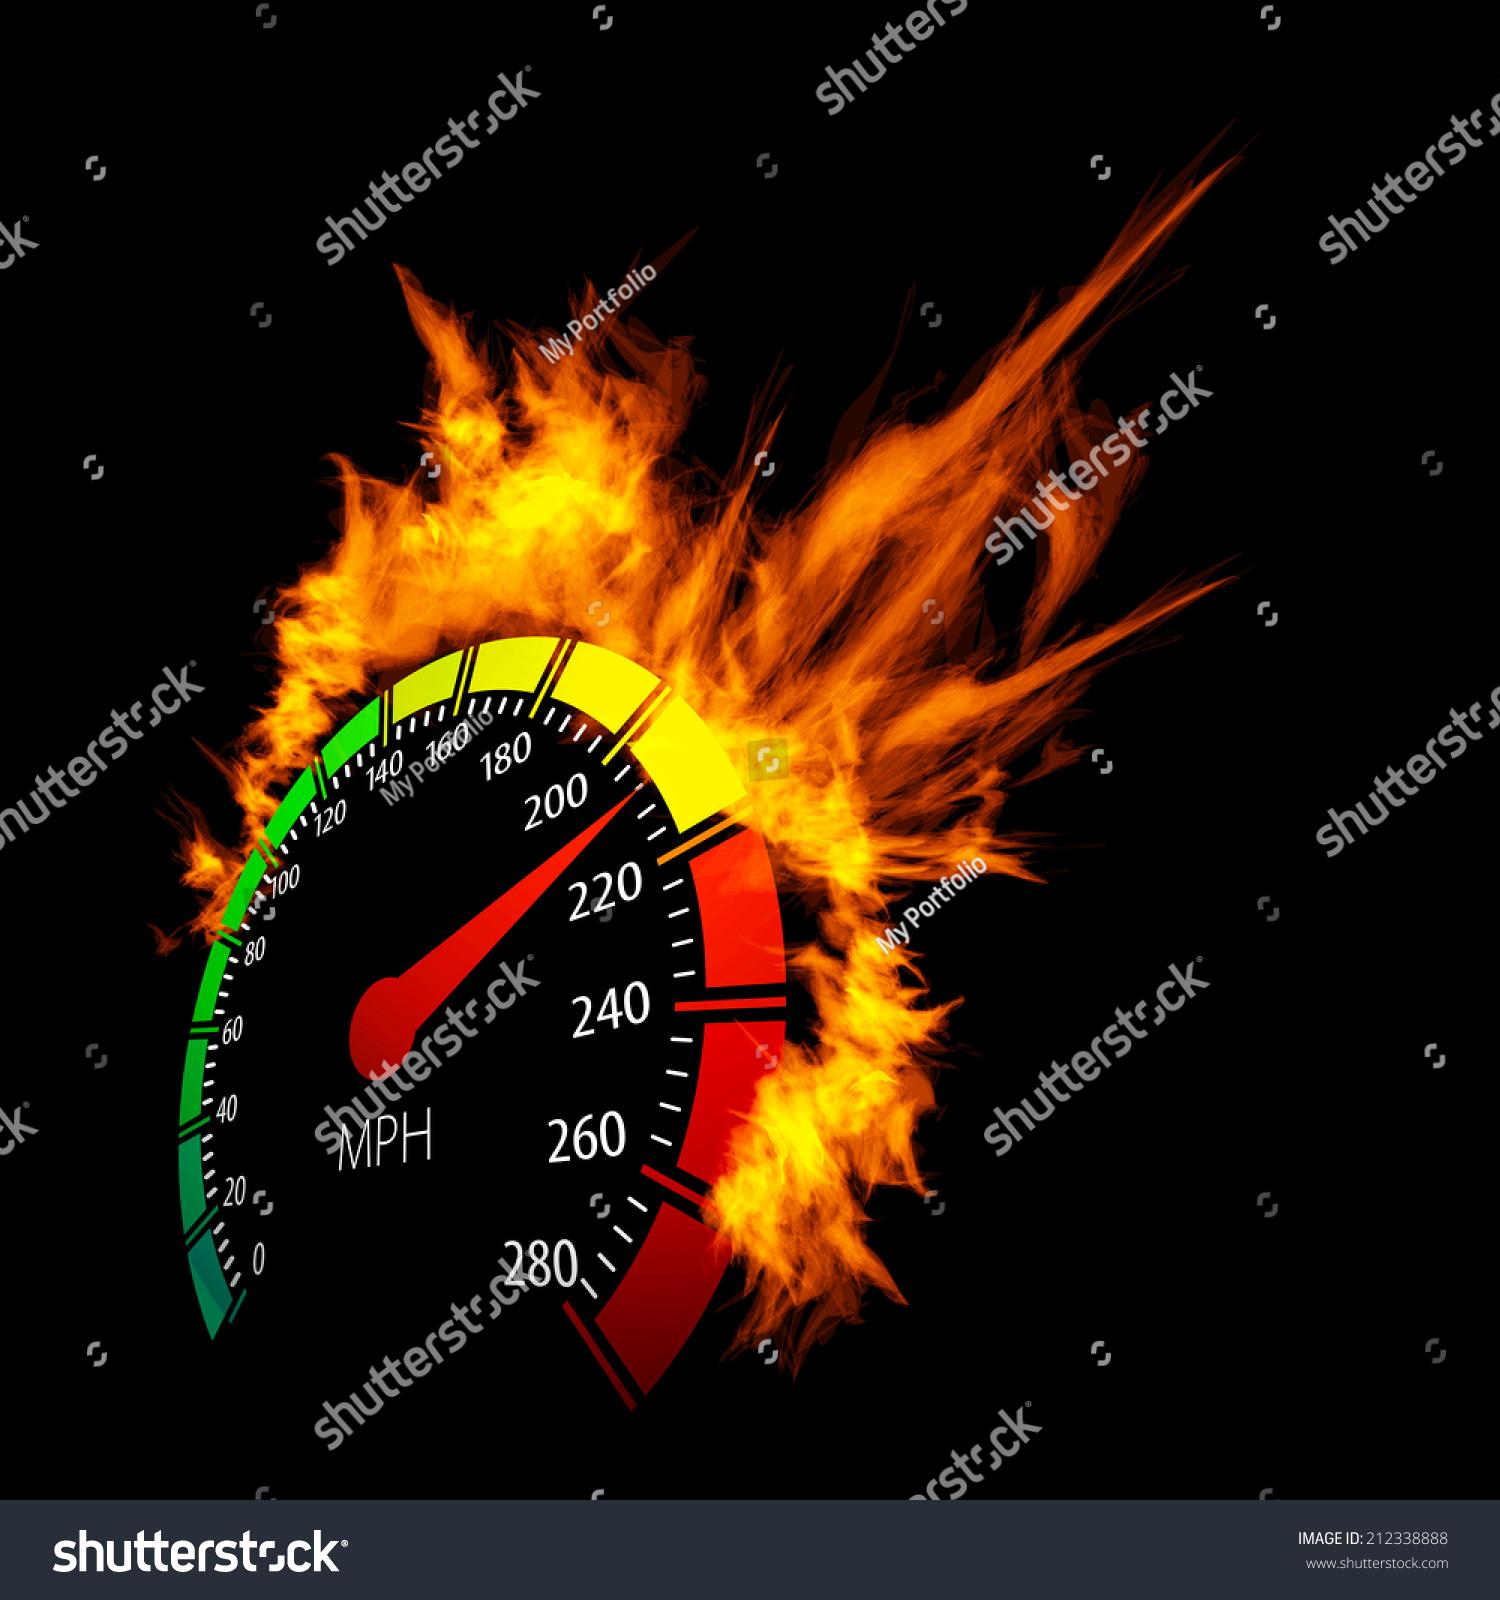 Danger 3d Wallpaper Download Burning Vector Speedometer Fire Flame Illustration Stock